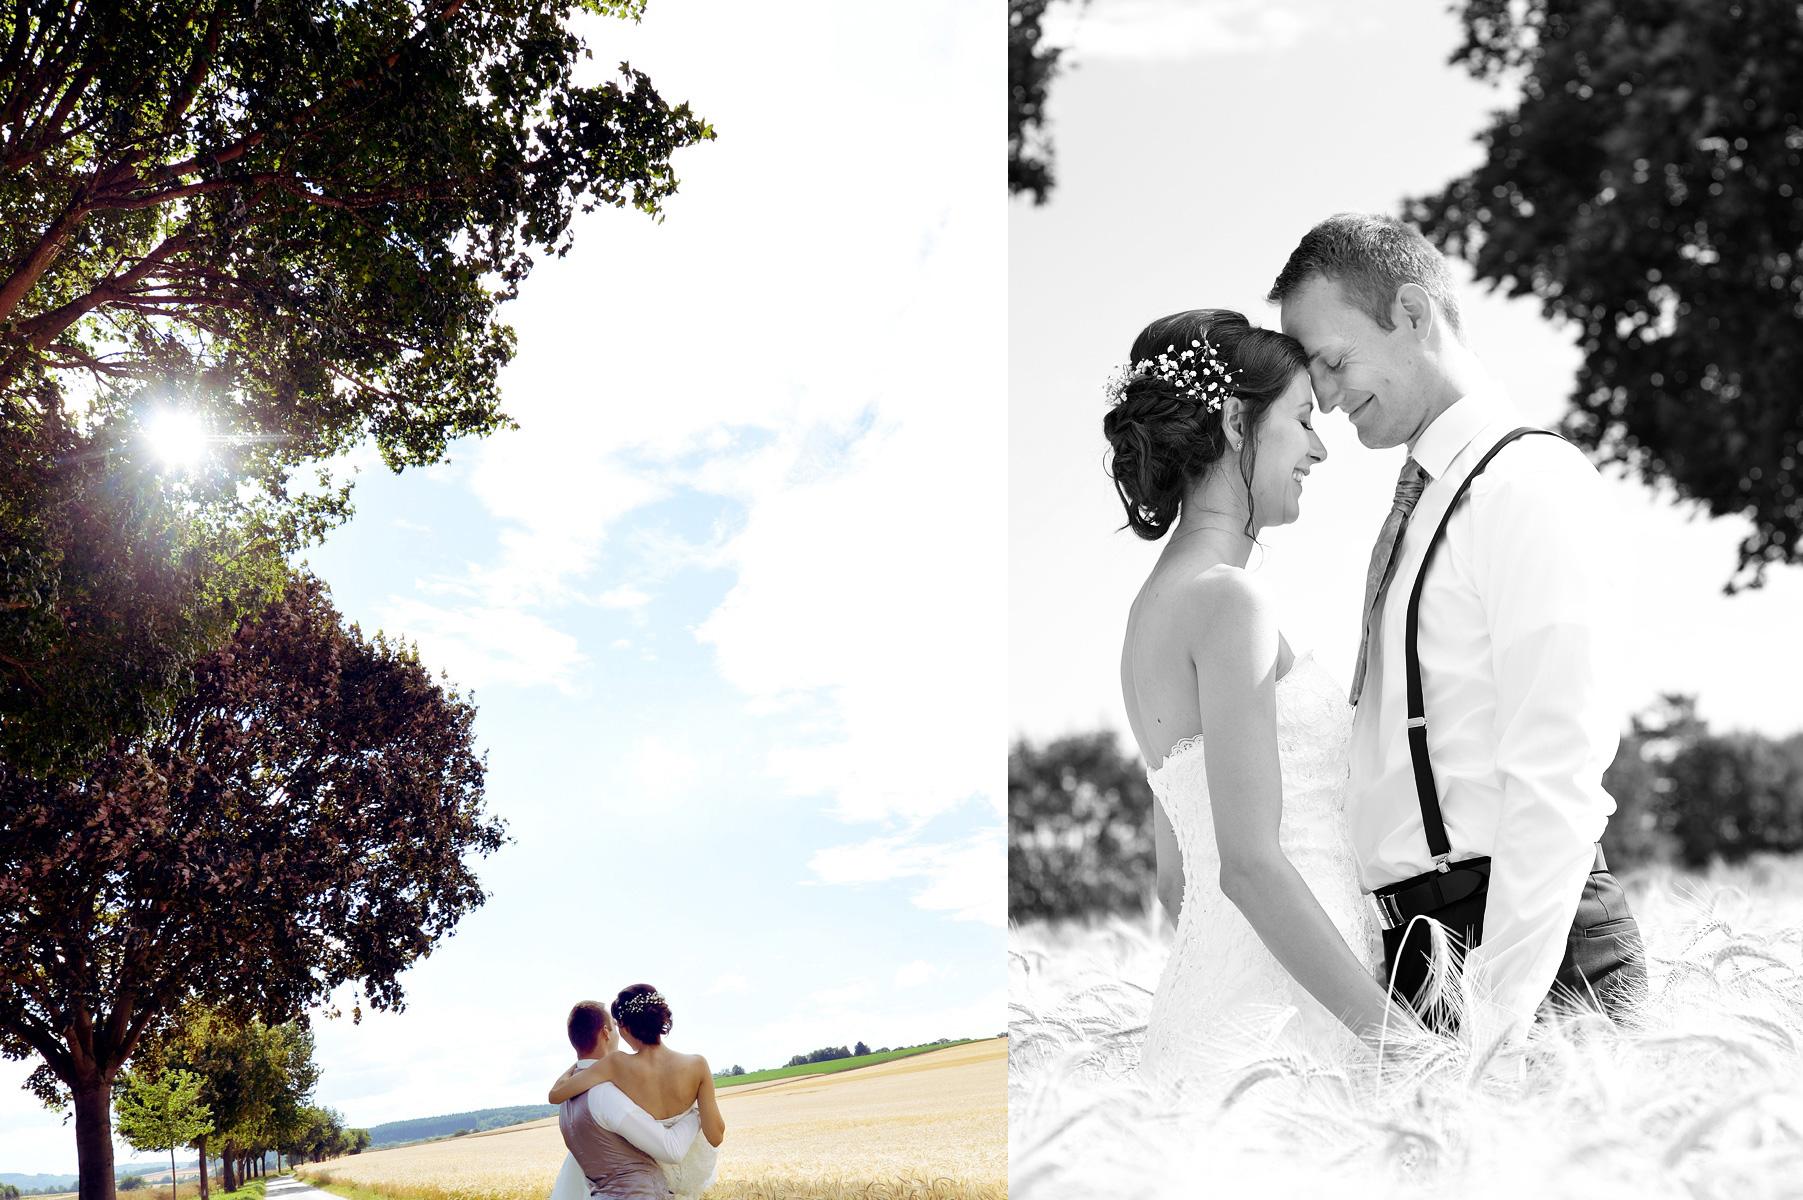 Hochzeitsfotos_nicole_bouillon_fotografie8